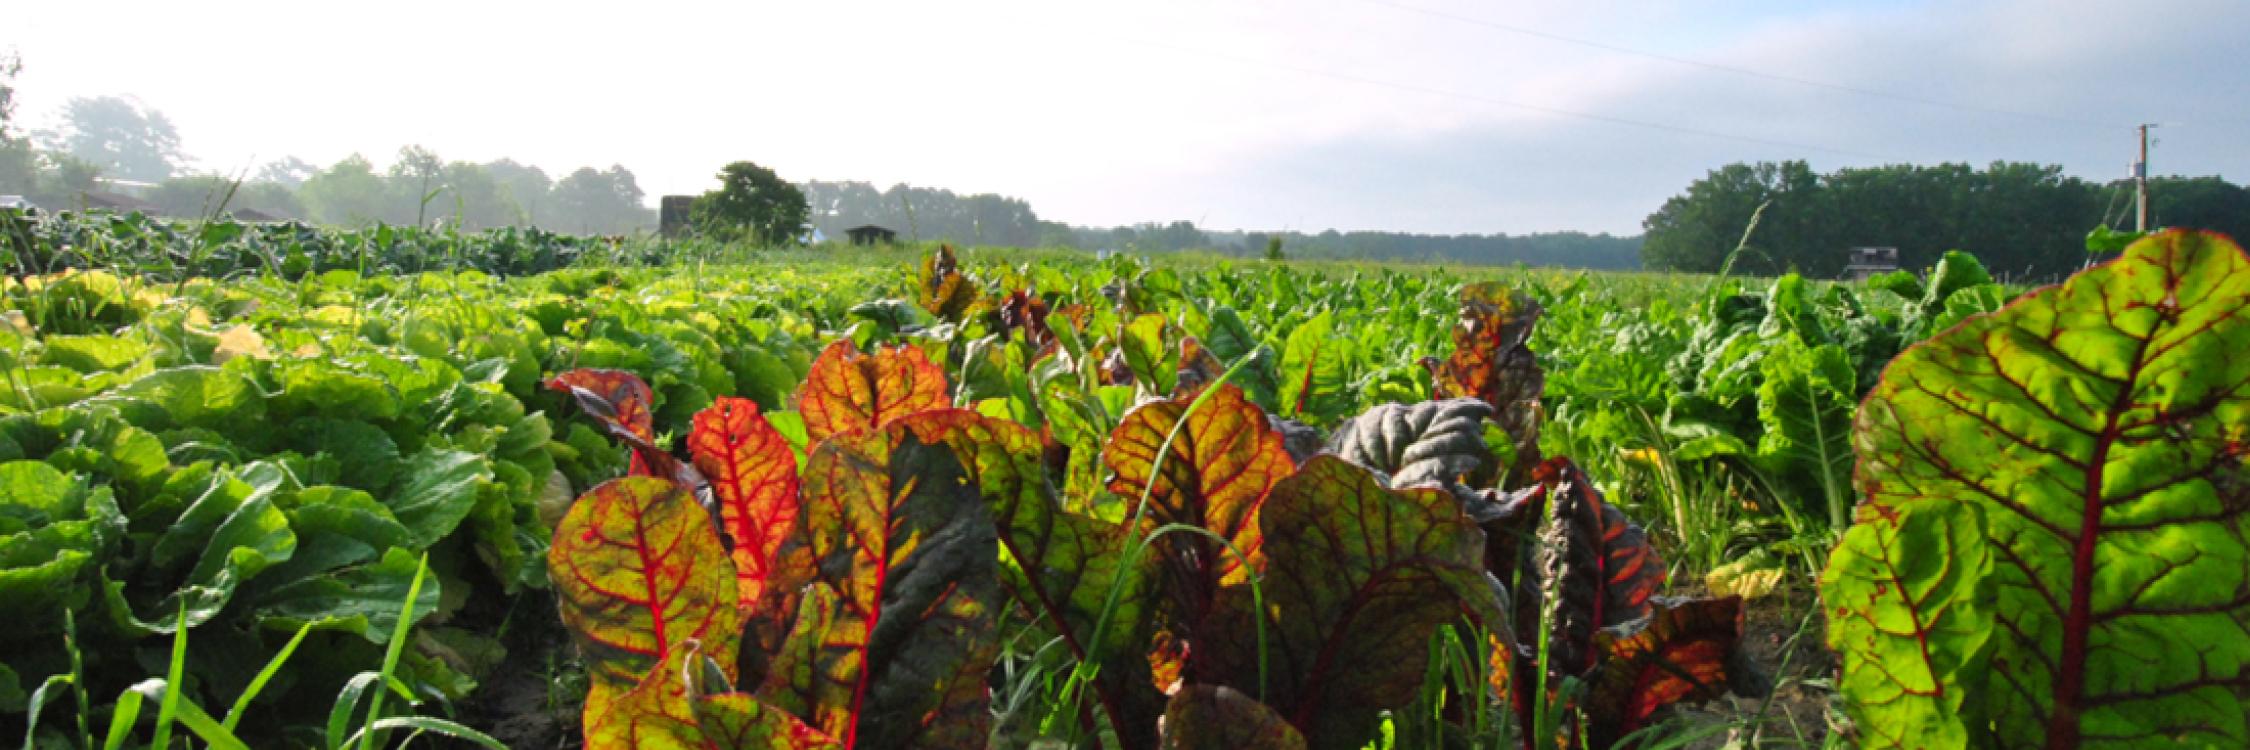 Image: New Earth Farm